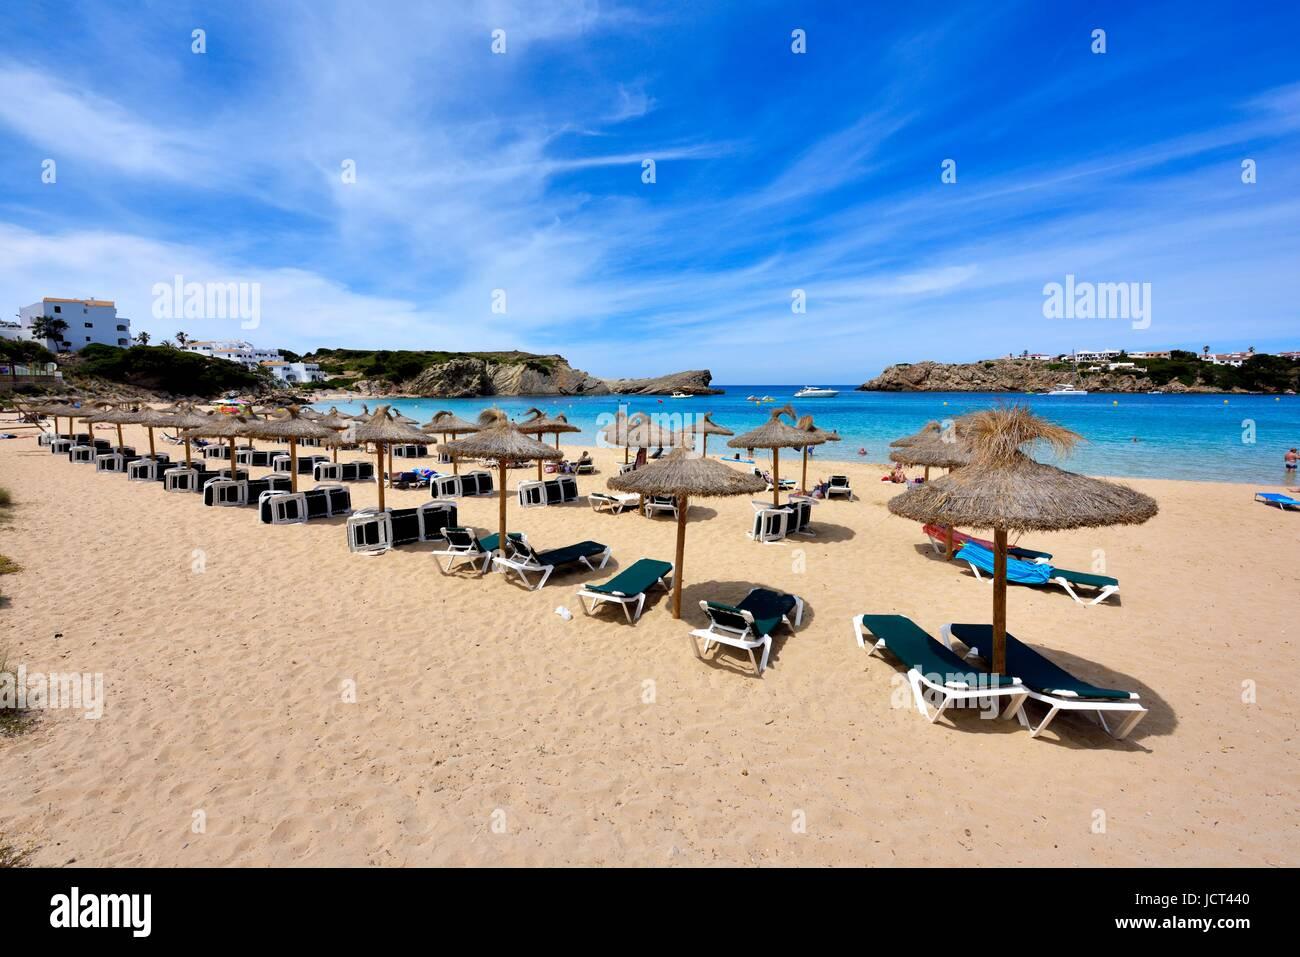 Arenal D'en Castell Menorca Spain - Stock Image